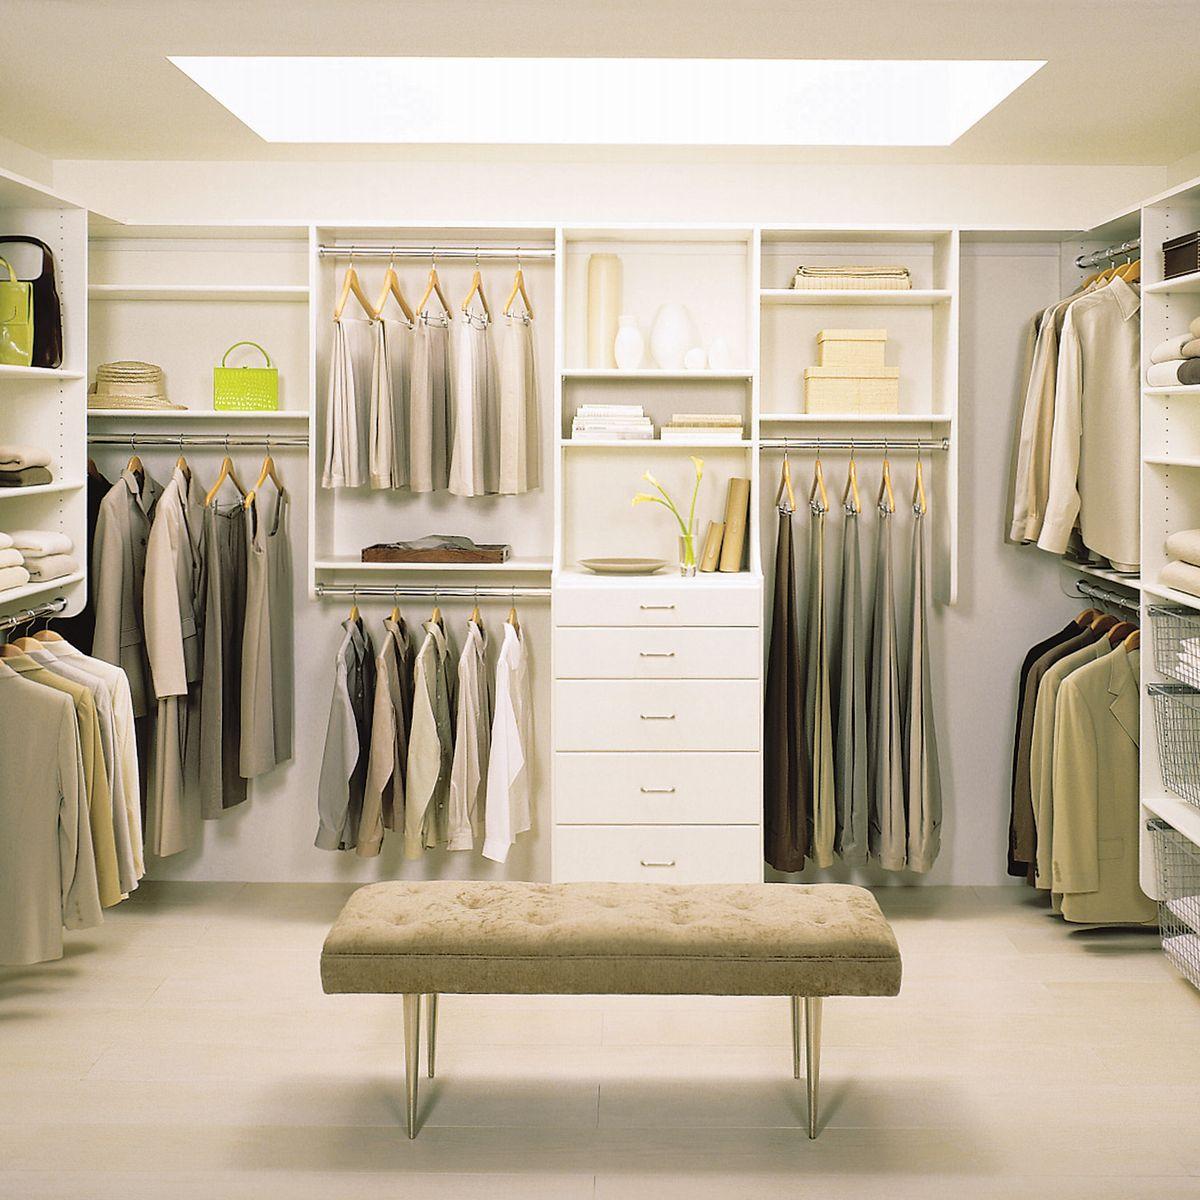 2017 Modern Simple Closet Wooden Designs In Bedroom Wall: 7 أفكار ممتازة لخزانة ملابس منظمة دائمًا